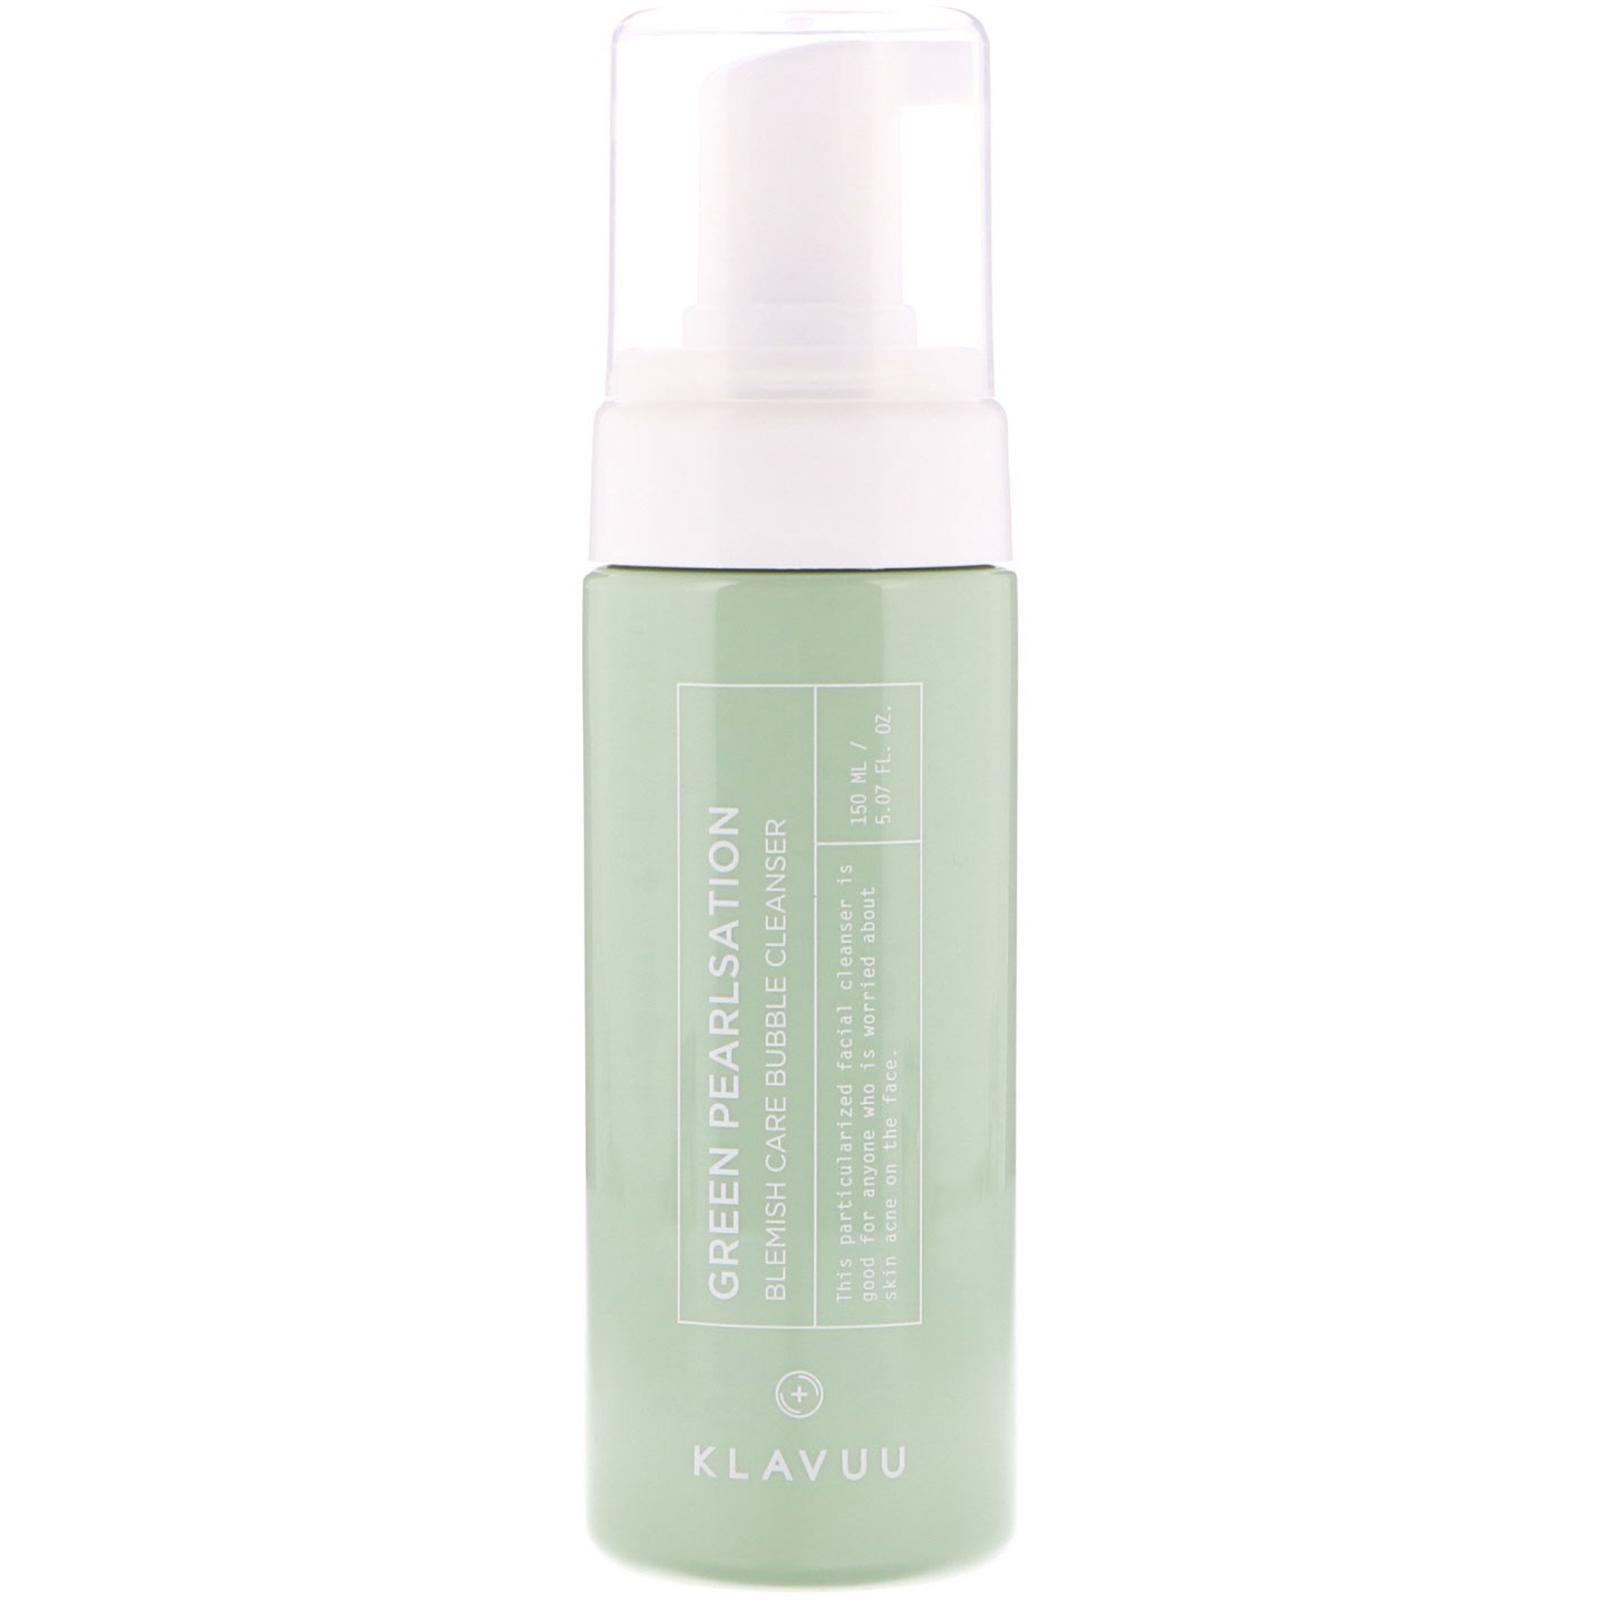 Klavuu Green Pearlsation Blemish Care Bubble Cleanser (150ml) - MissDewy